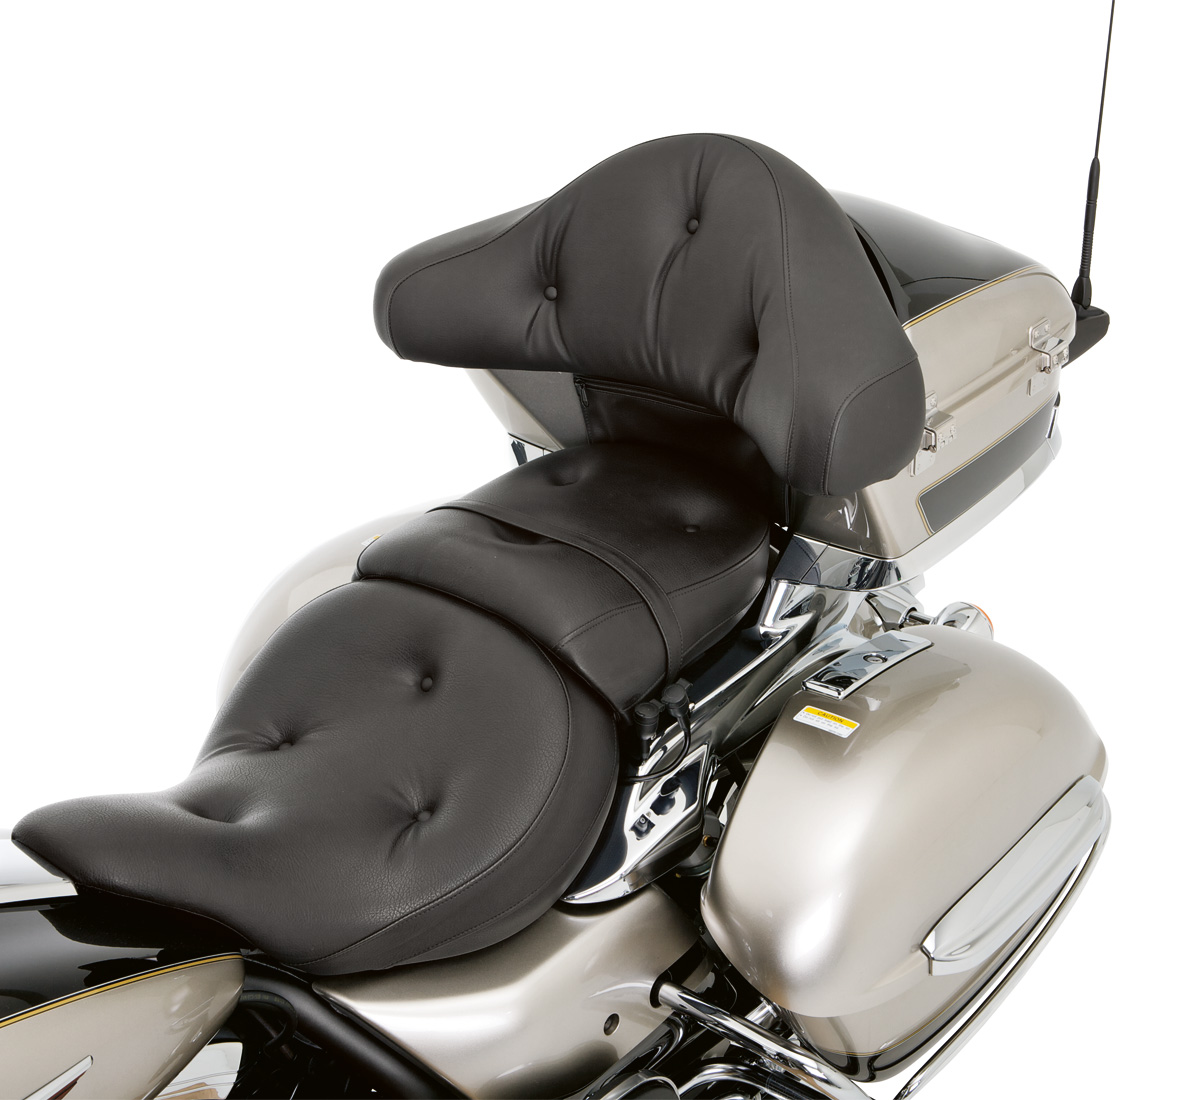 2016 vulcan® 1700 voyager® abs pillow top gel seat, rear